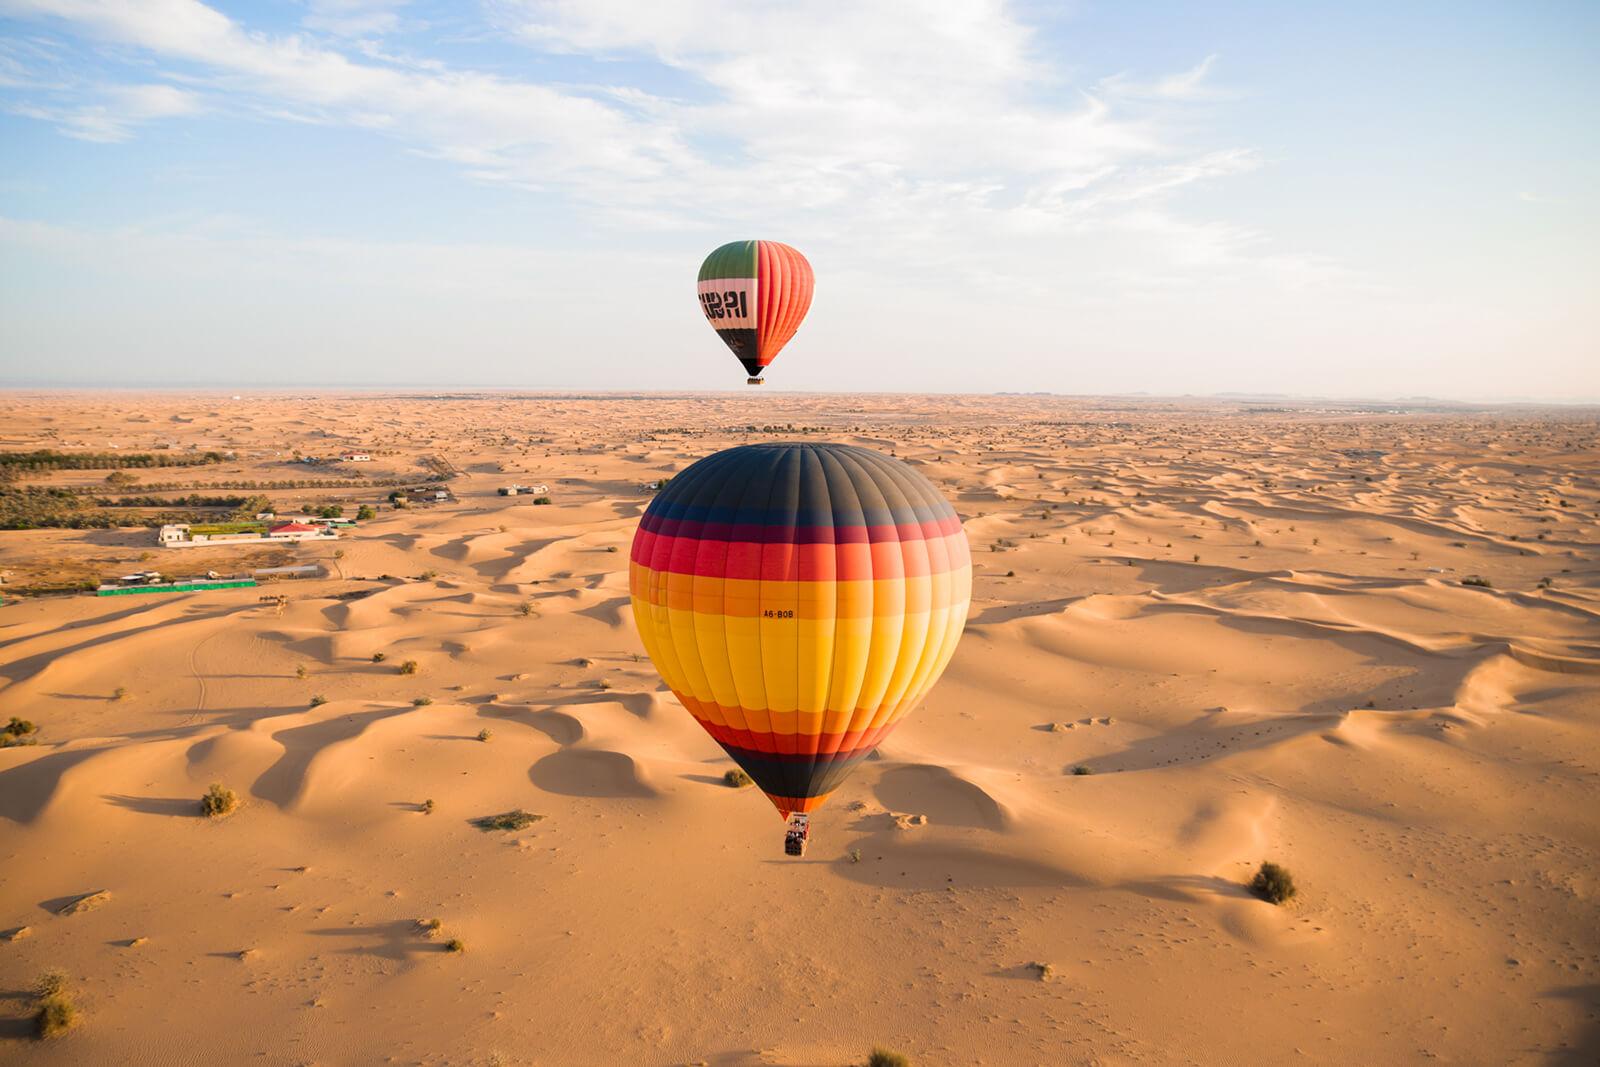 Balloon Rides In Dubai ? Look For A Mesmerizing Experience While Choosing A Balloon Ride Dub